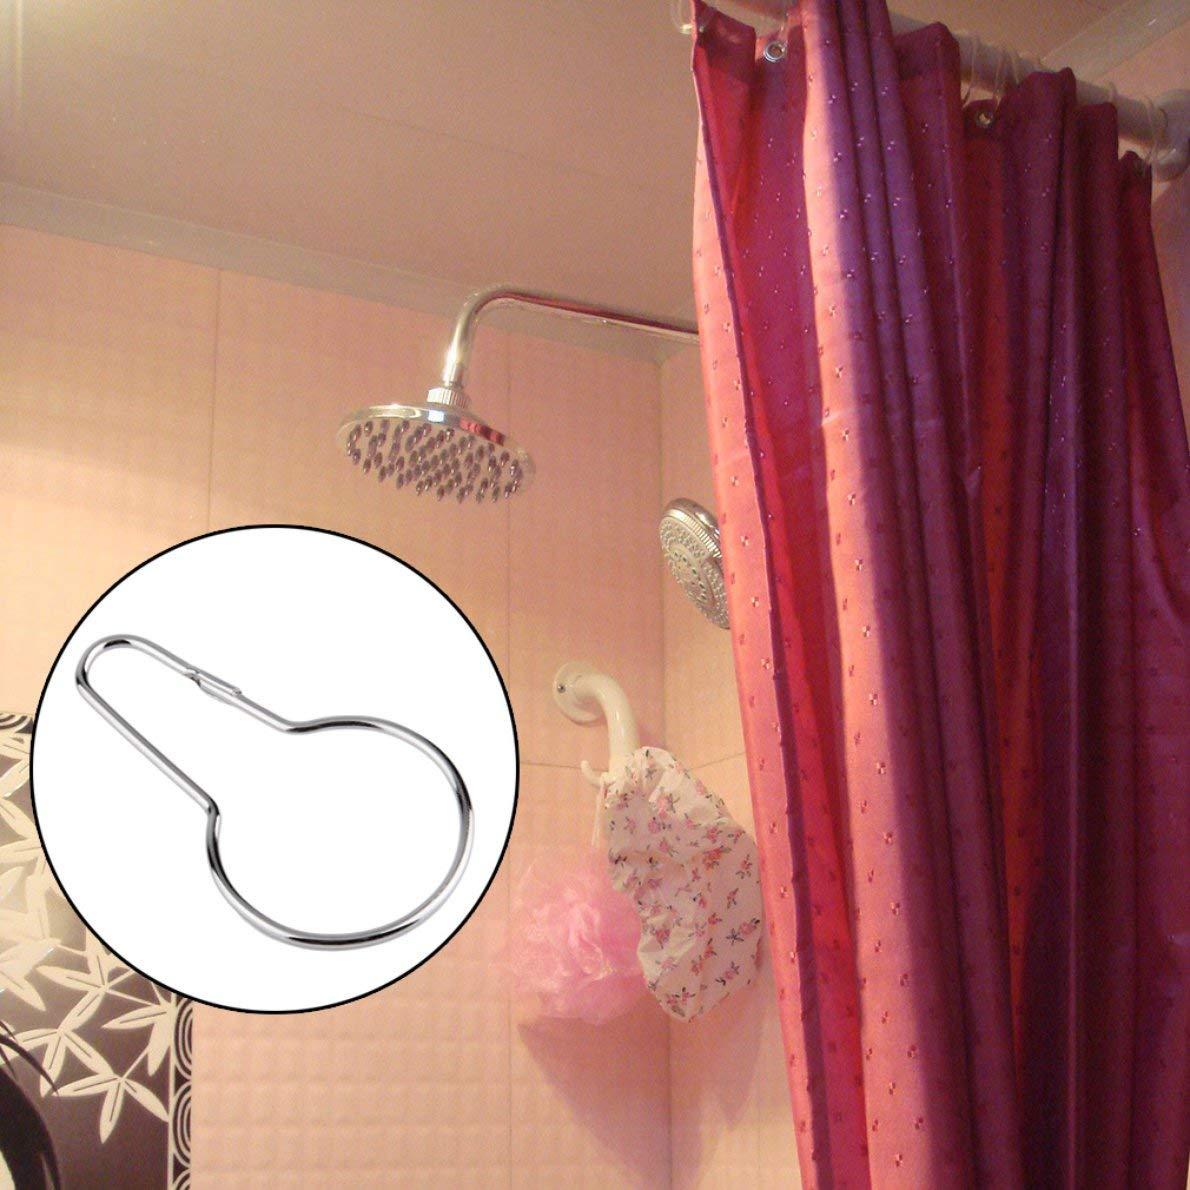 Superior quality12pcs Shower Bath Bathroom Curtain Rings Clip Easy Glide Hooks Chrome PlatedStylish